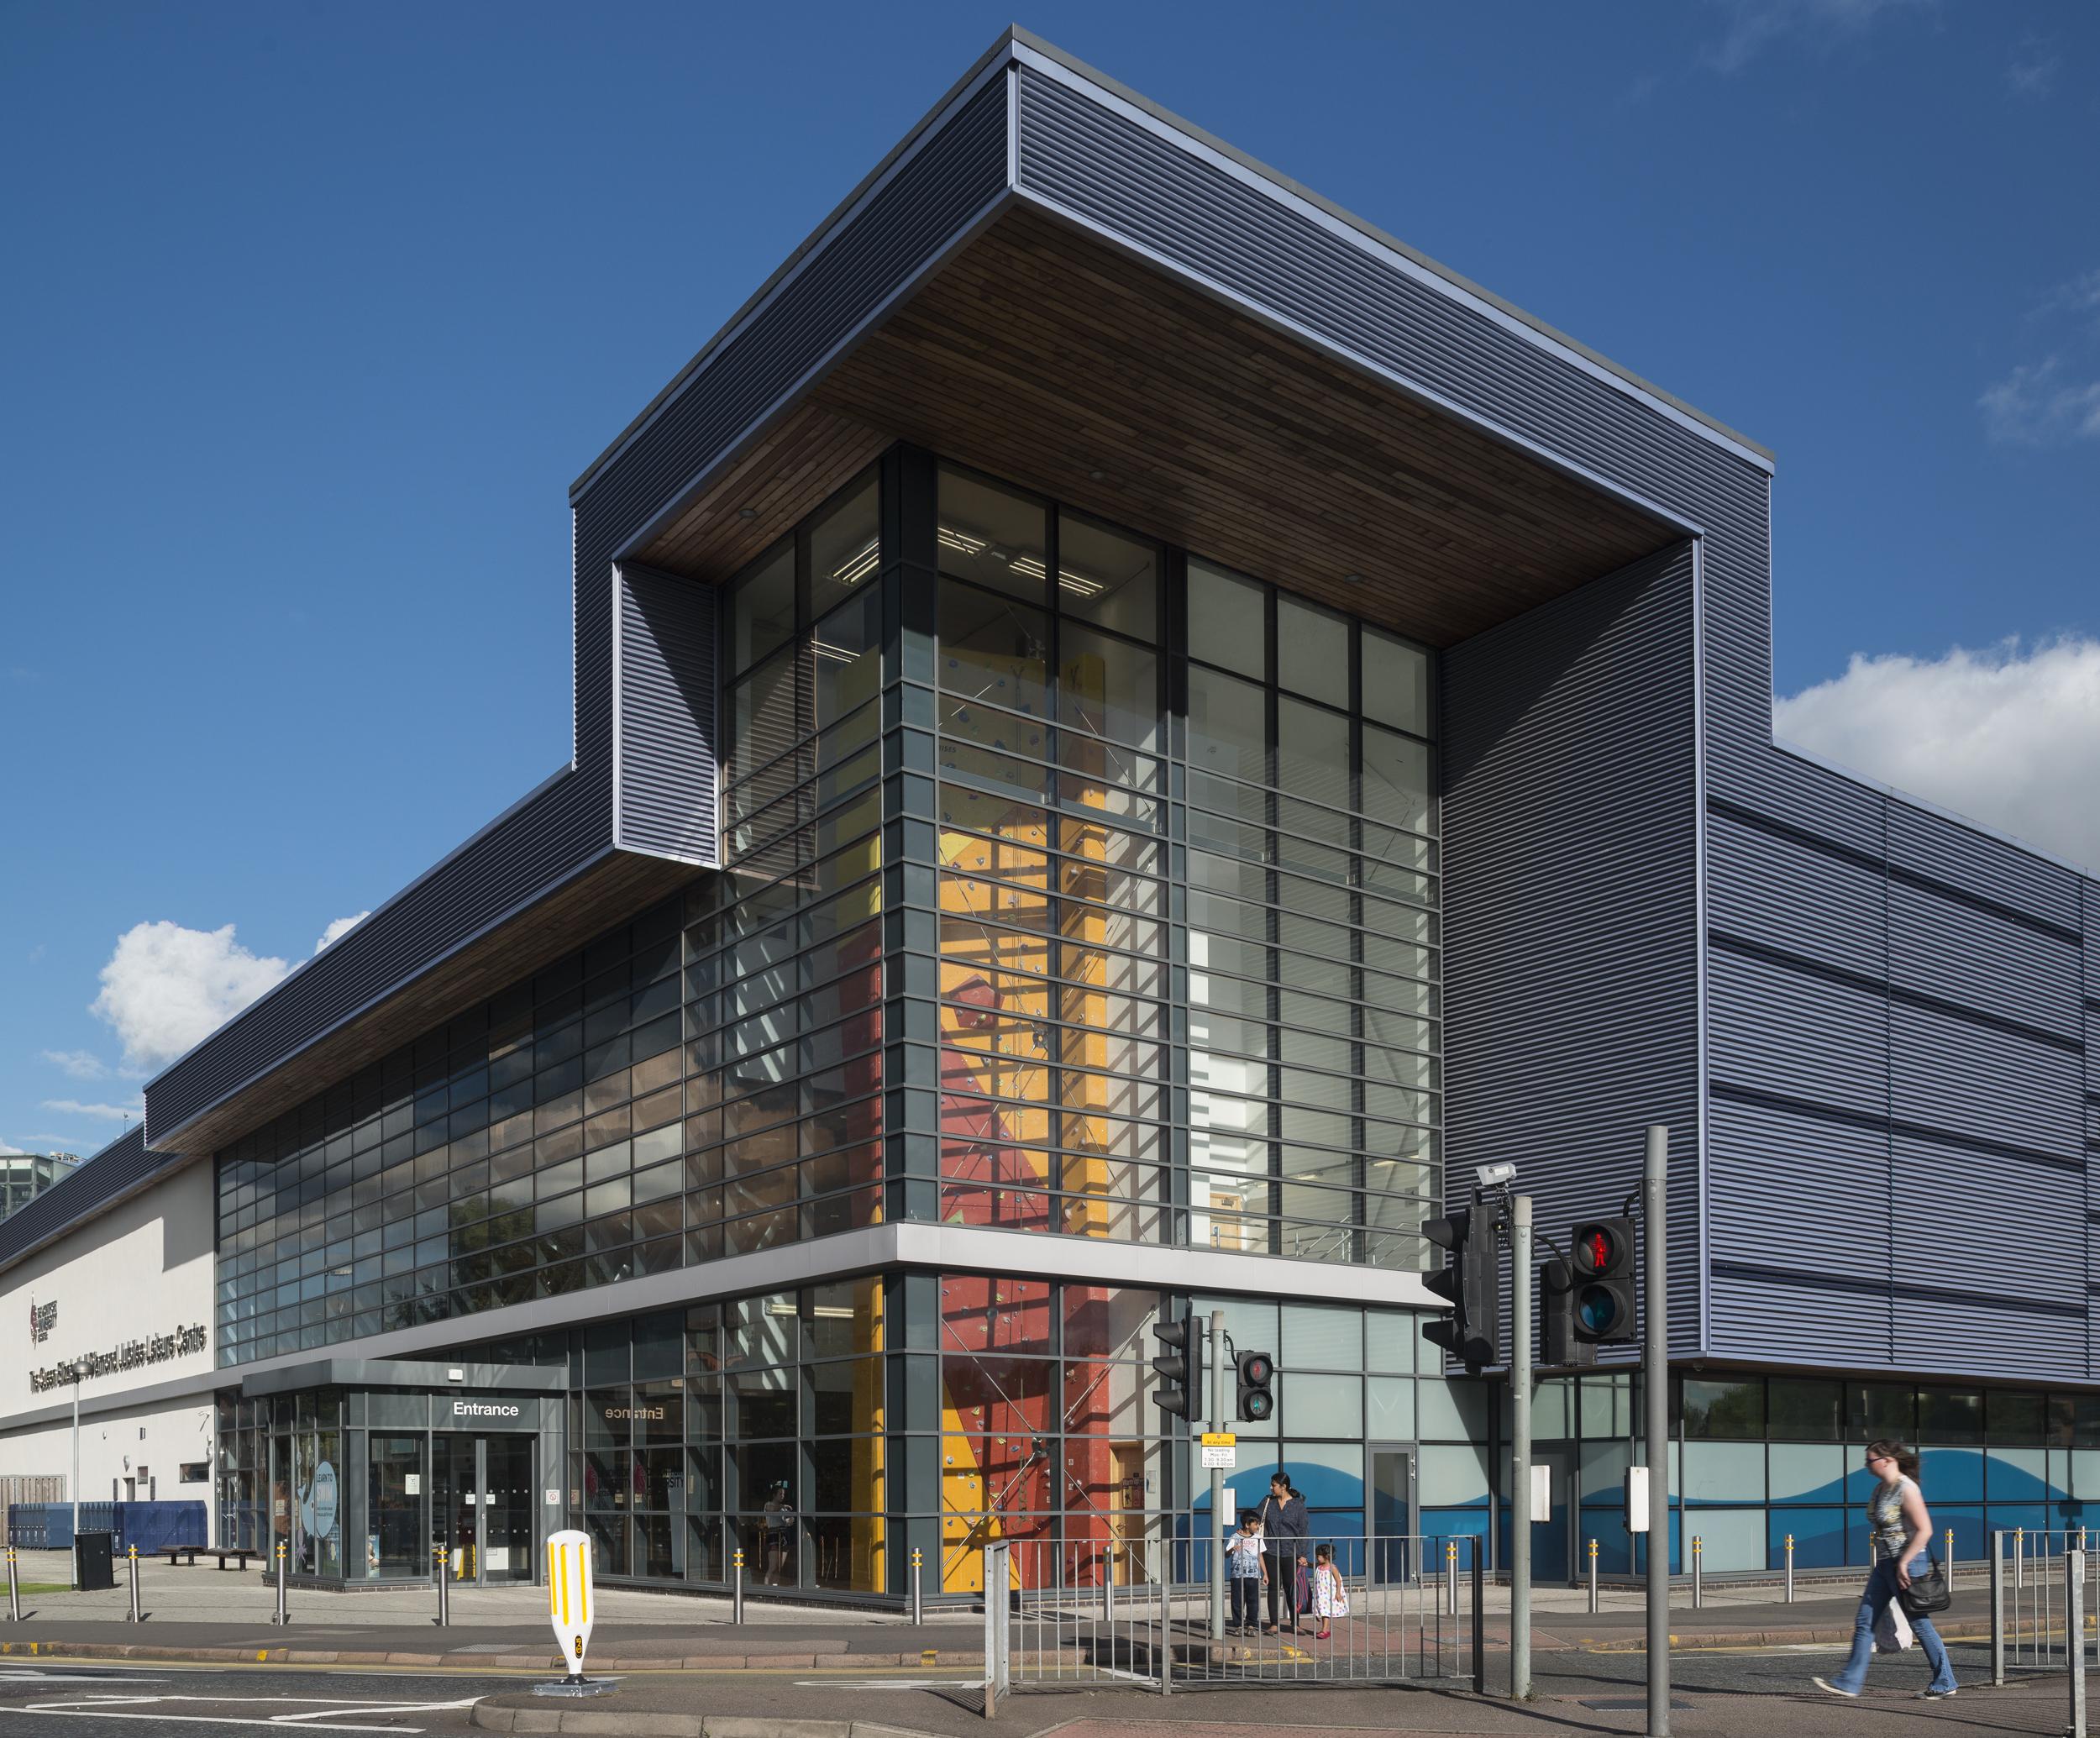 Queen Elizabeth Leisure Centre - Leicester